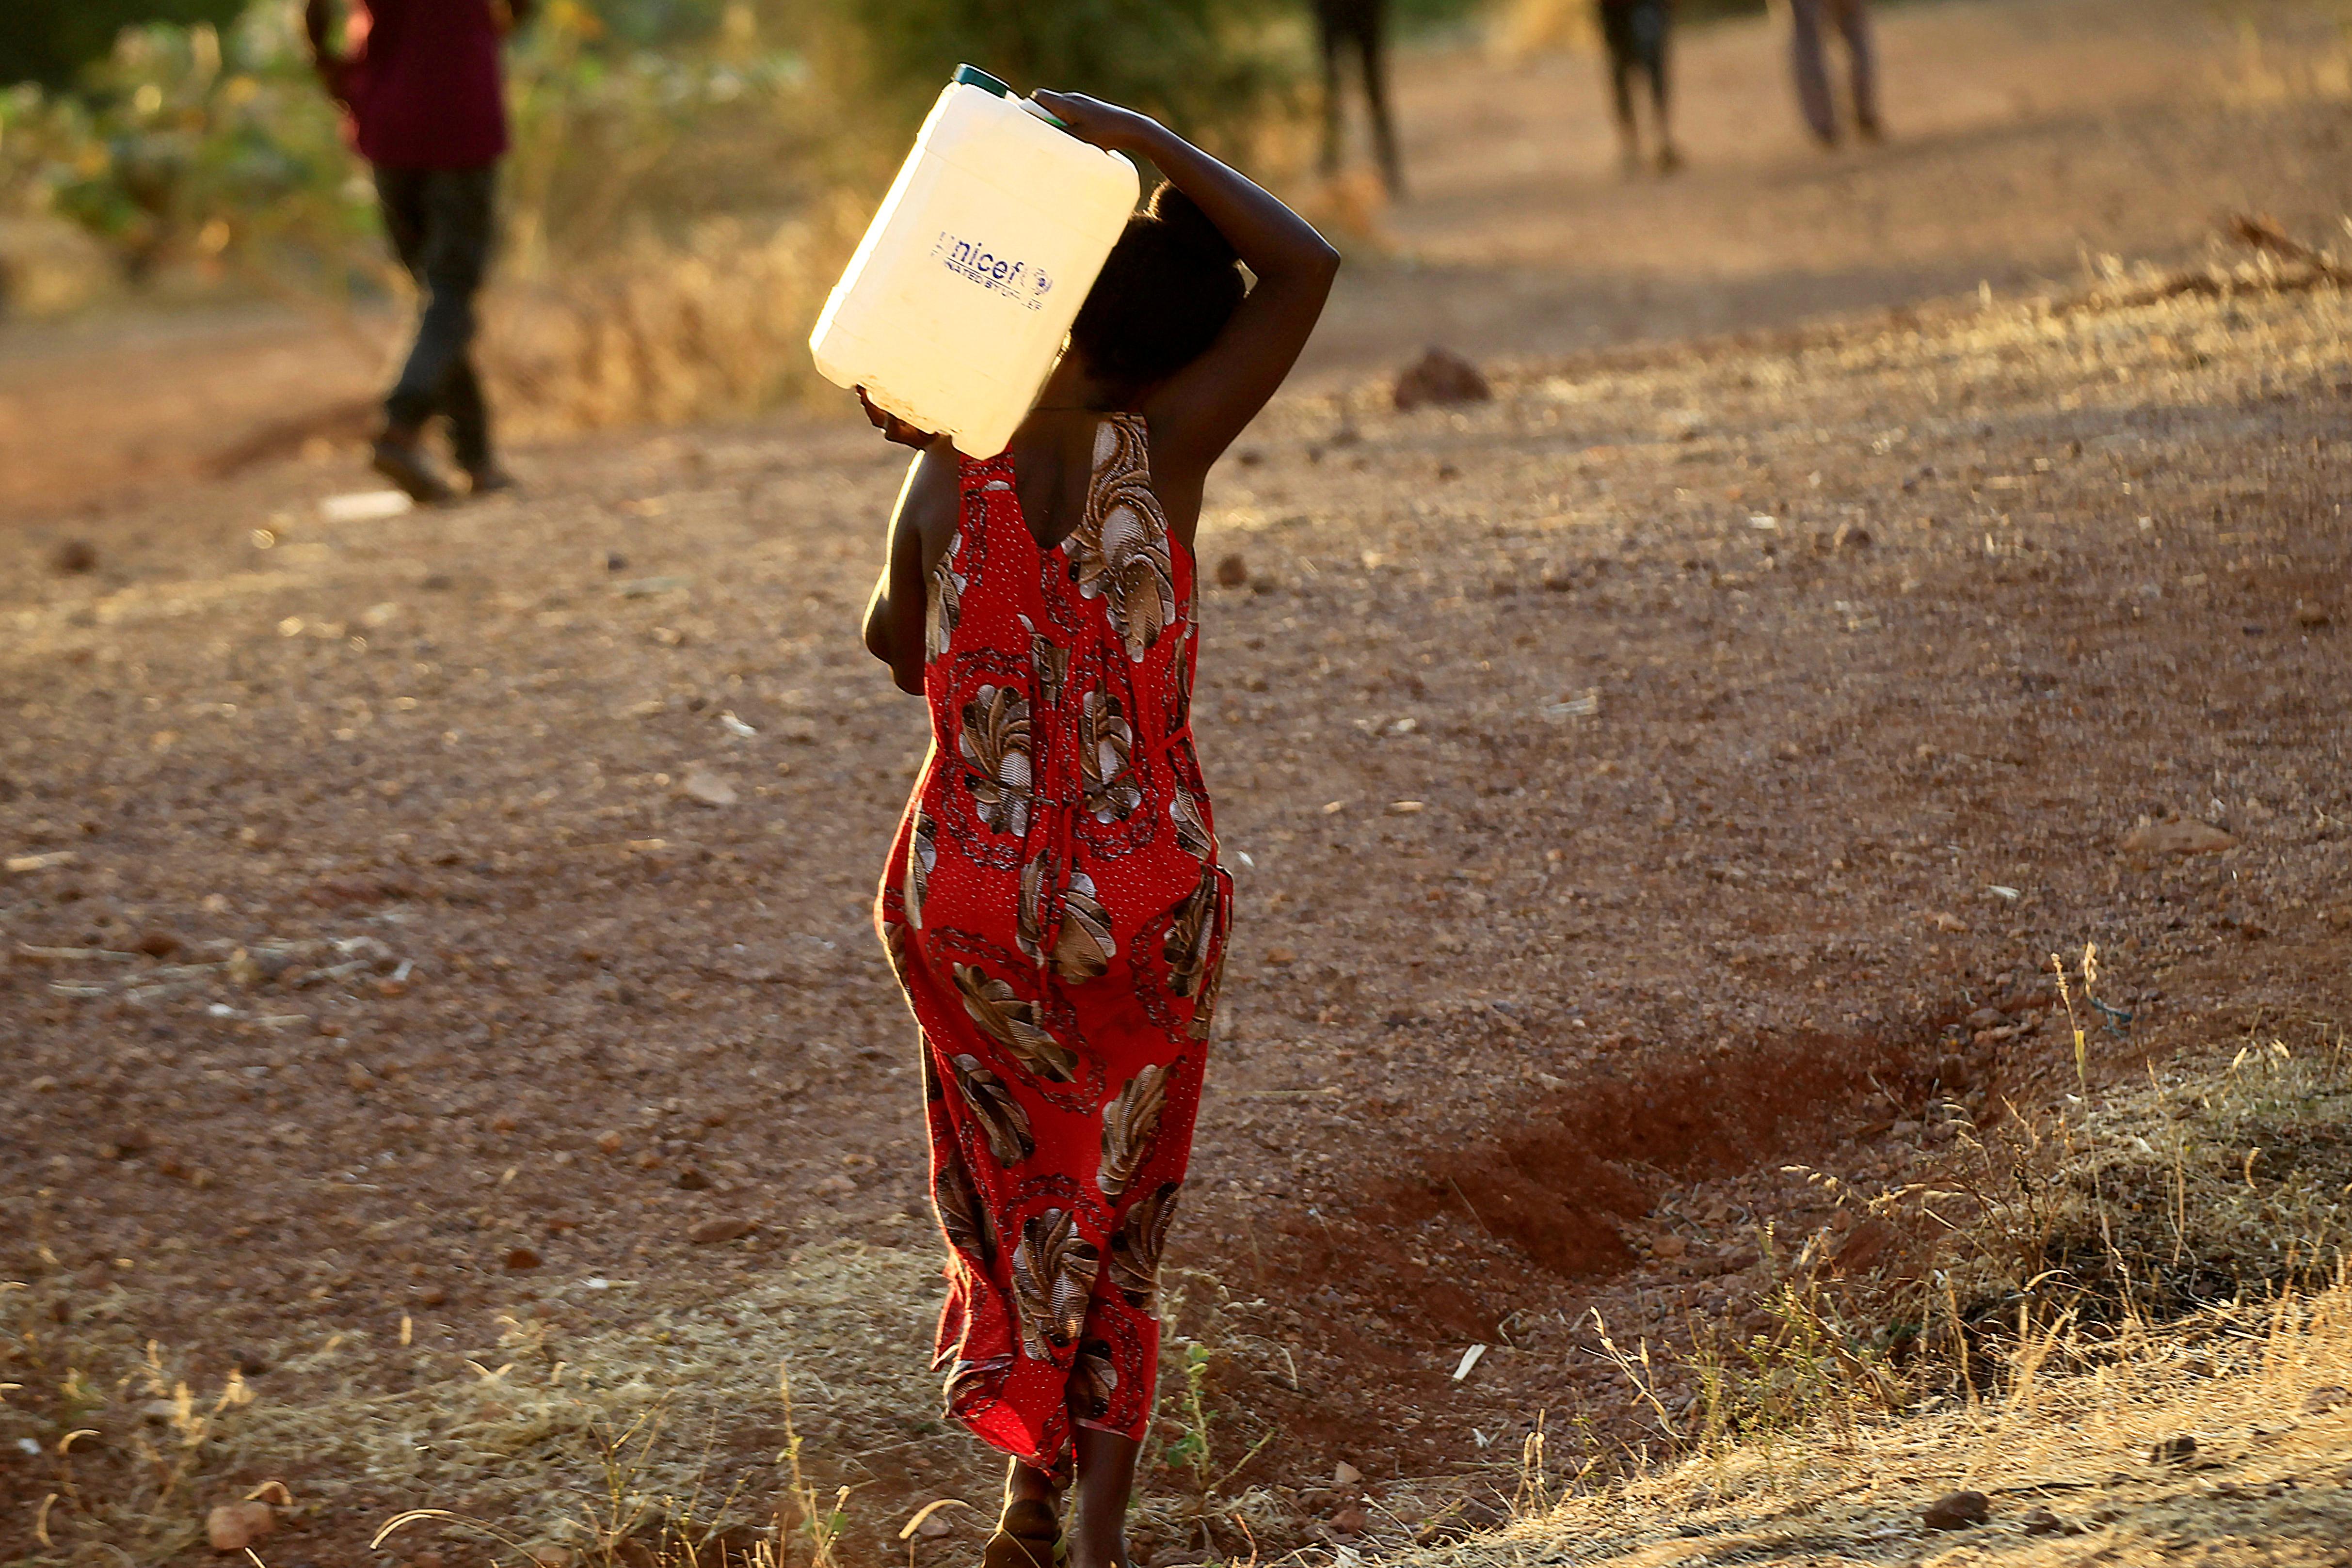 An Ethiopian woman who fled war in Tigray region carries a jerrycan of water as she walks at the Um-Rakoba camp on the Sudan-Ethiopia border in Al-Qadarif state, Sudan November 19, 2020. REUTERS/Mohamed Nureldin Abdallah/File Photo